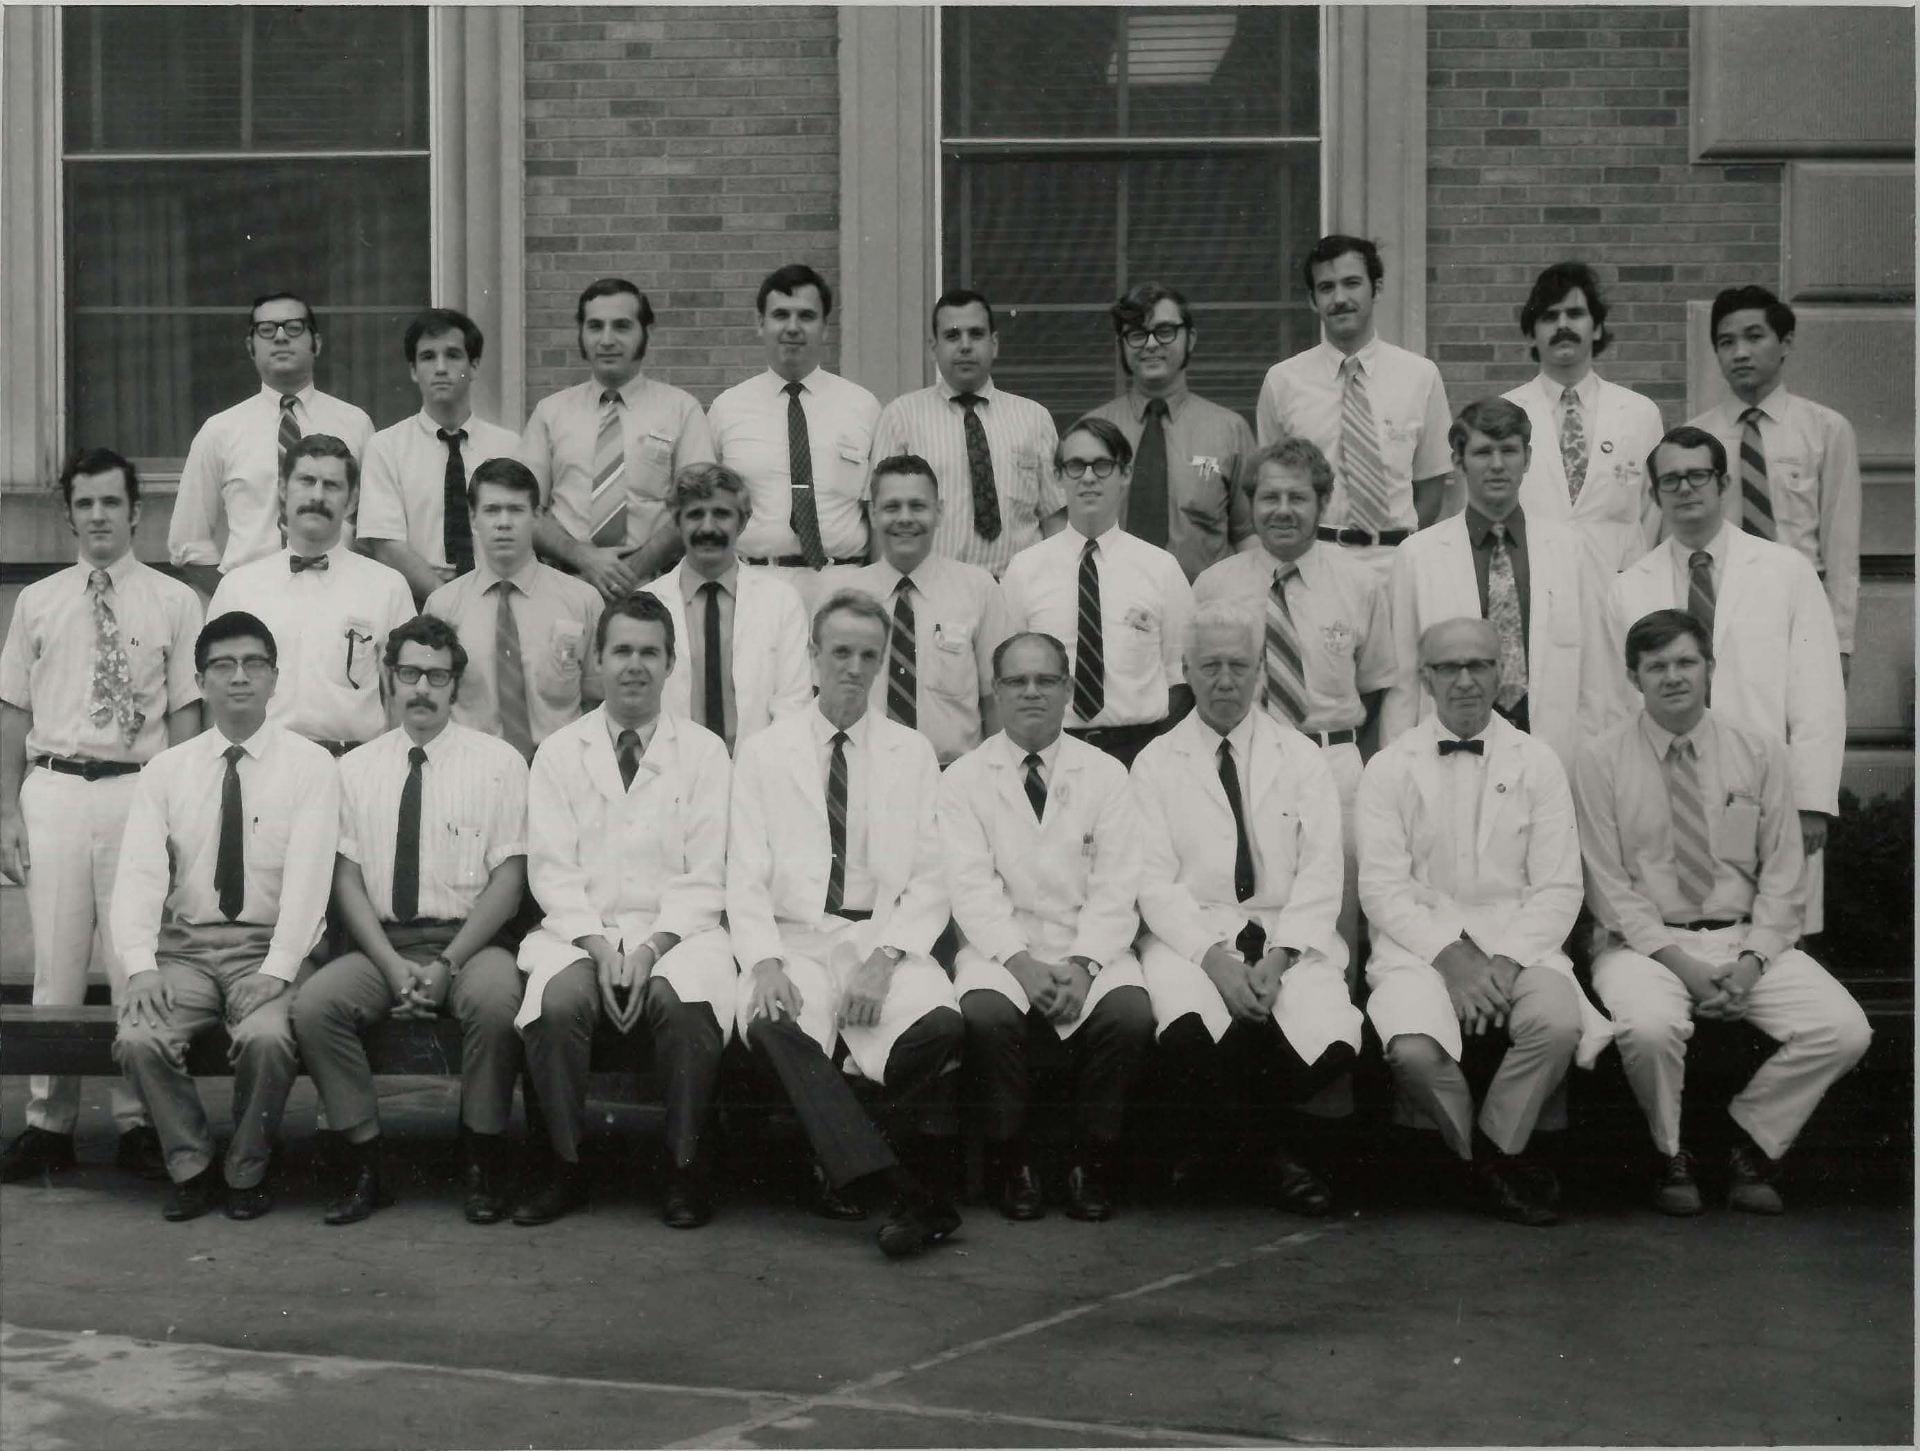 1969 Housestaff Photo (1)